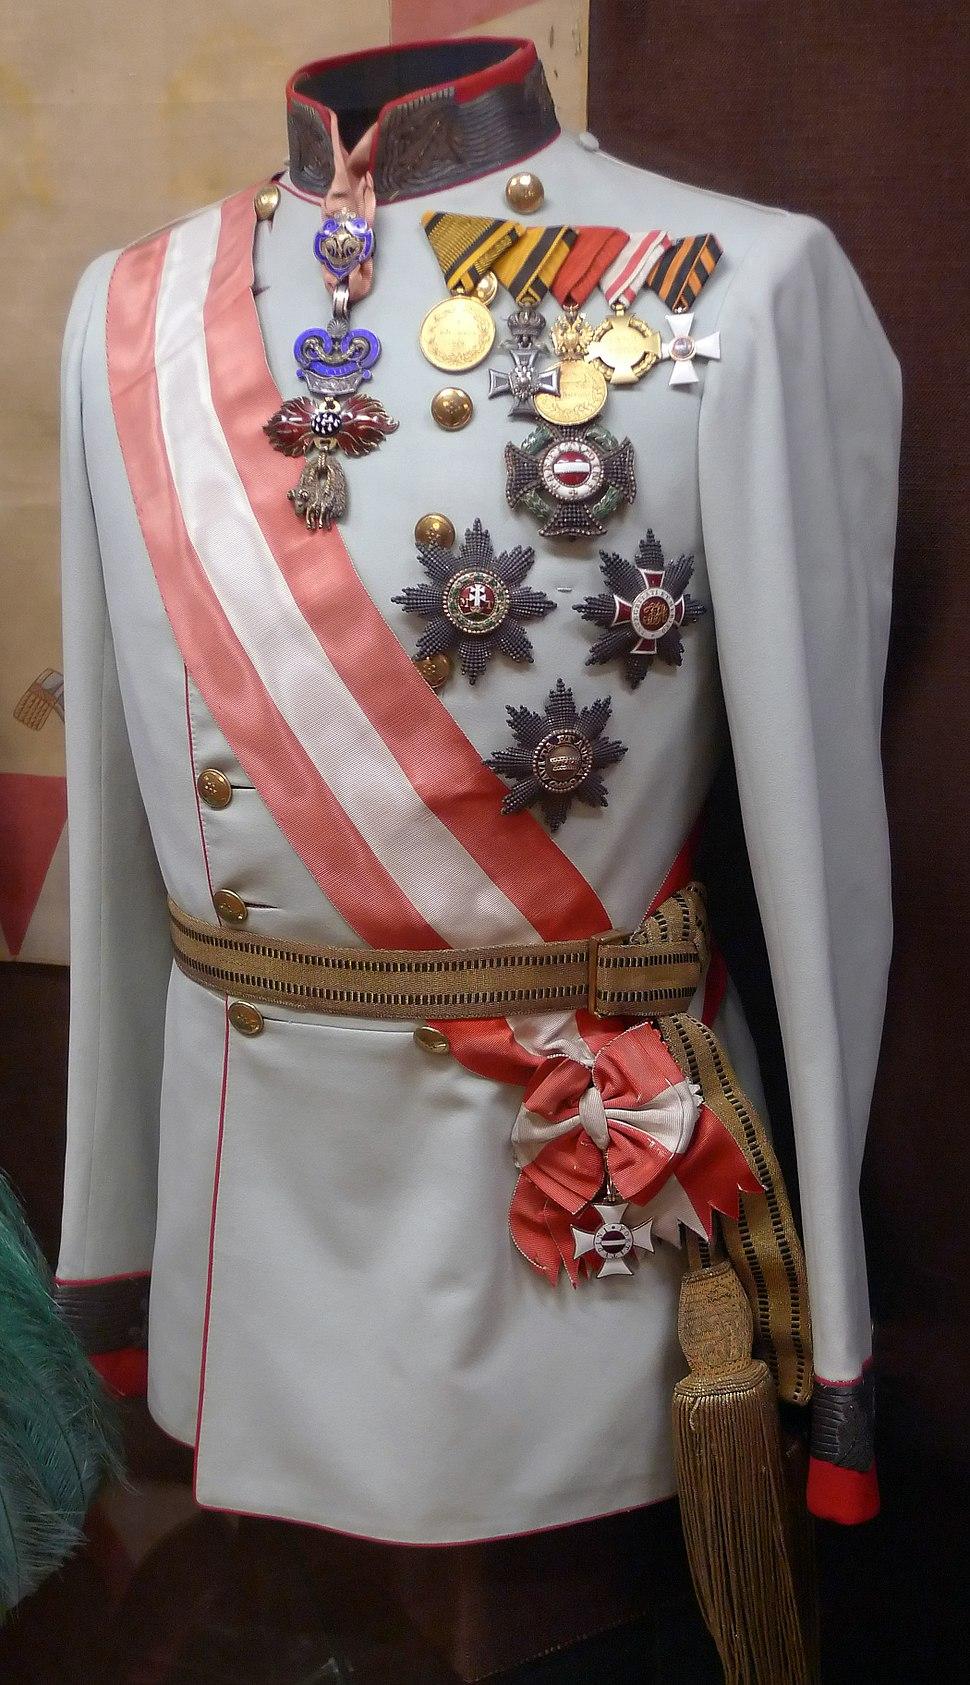 Galauniform von Kaiser Franz Joseph I